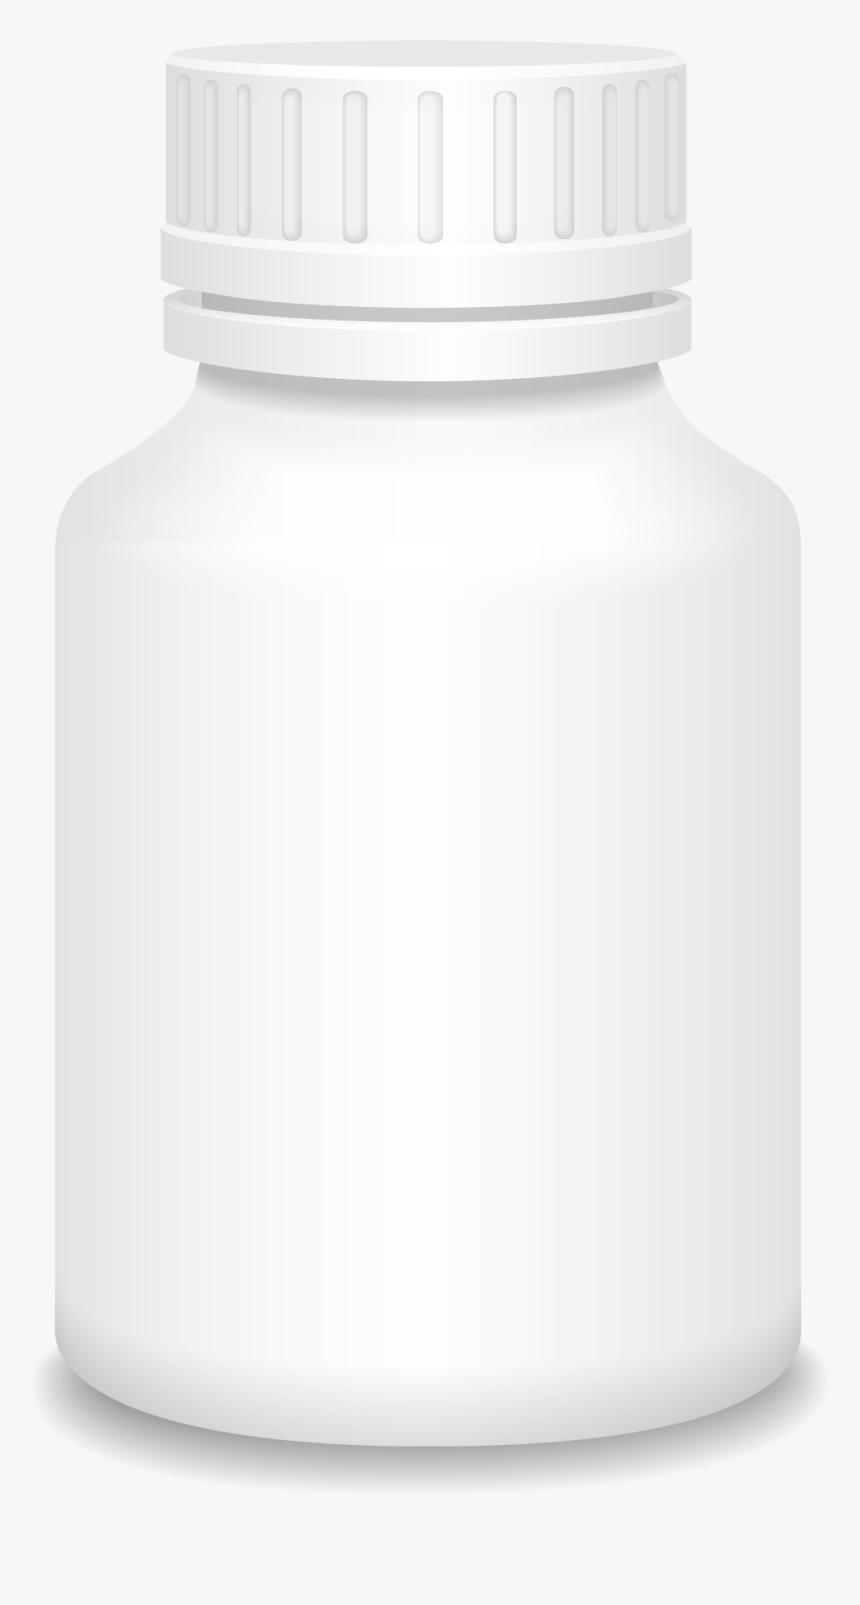 Medicine White Vector Bottle Plastic Png Download Free - Plastic Bottle, Transparent Png, Free Download